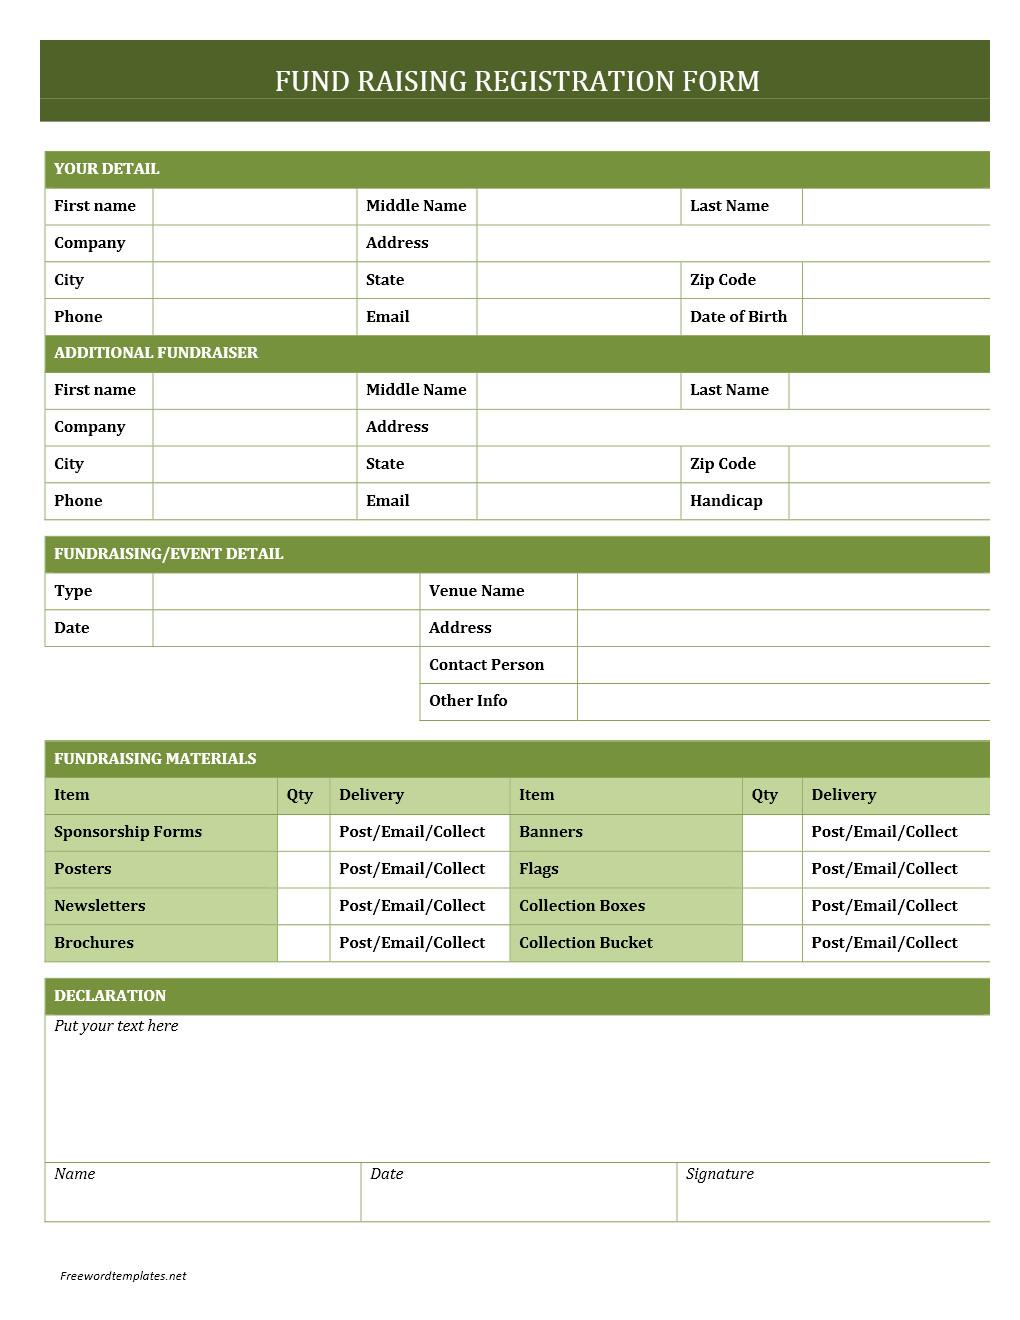 Registration form Template Microsoft Word Fundraising Registration form